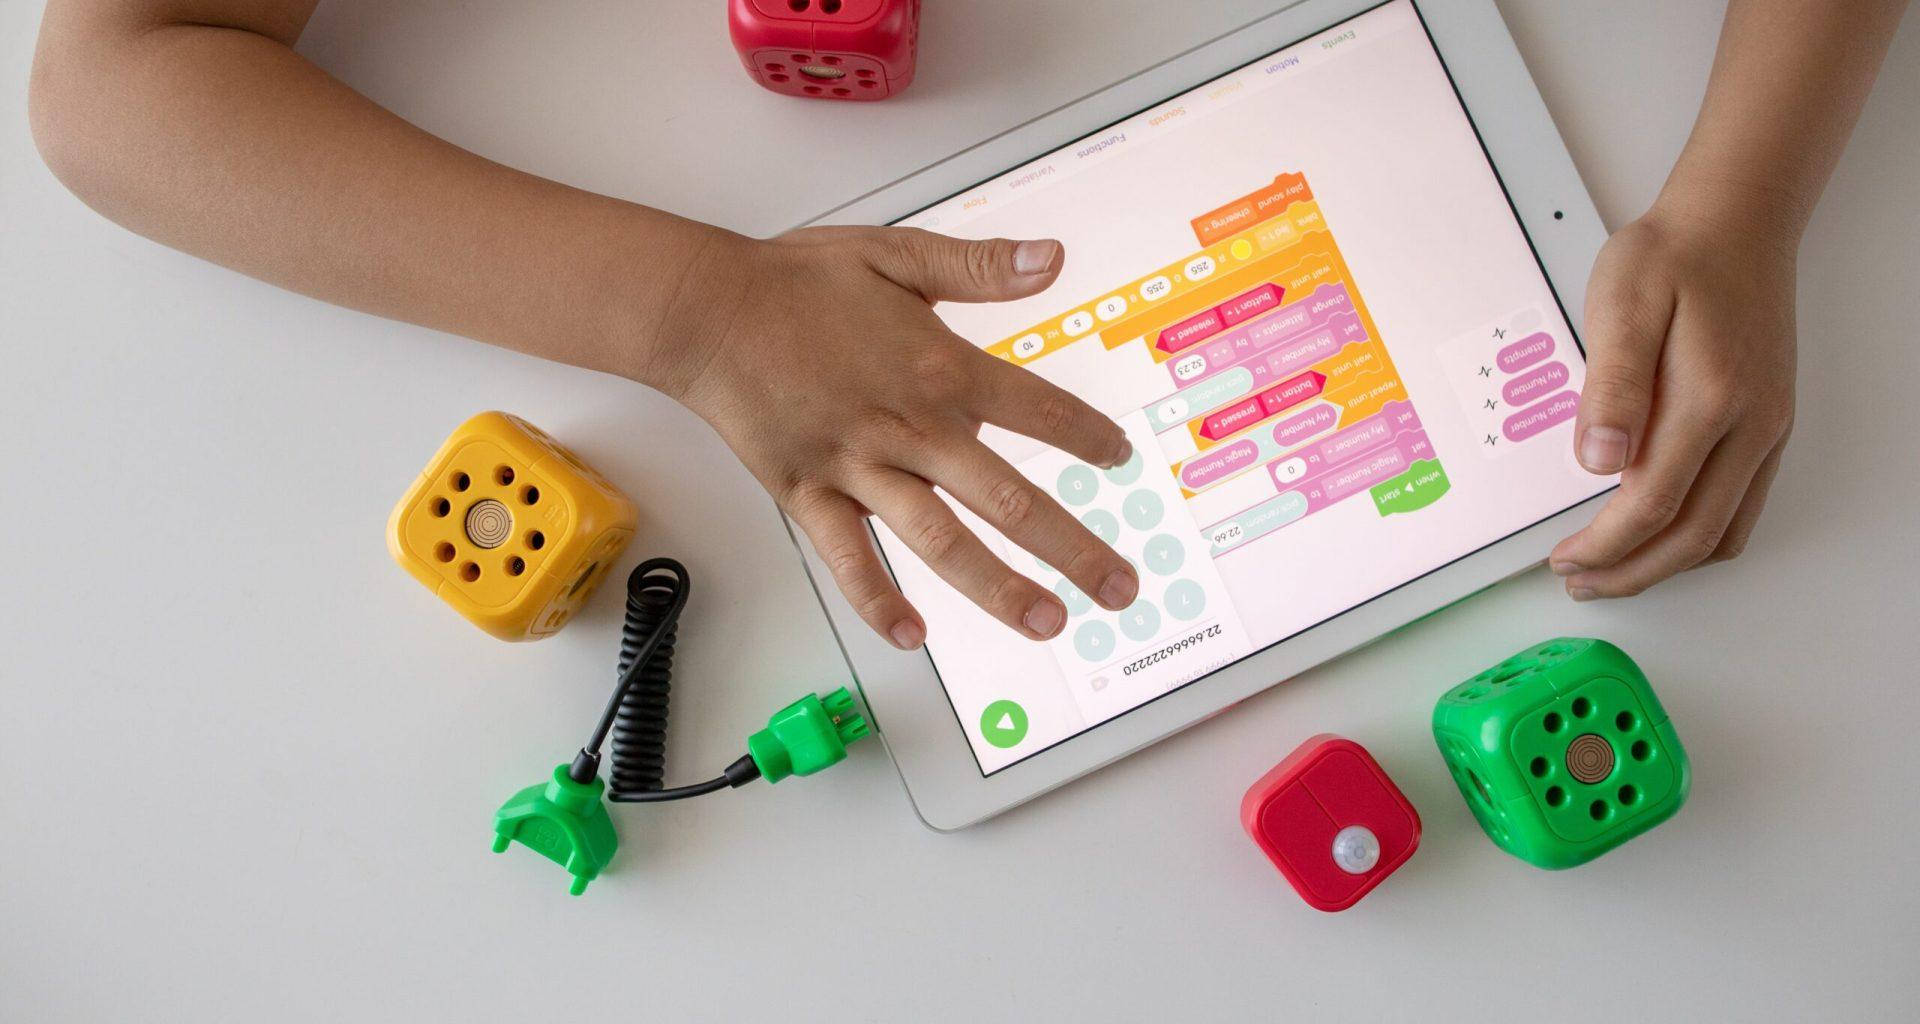 children learn coding